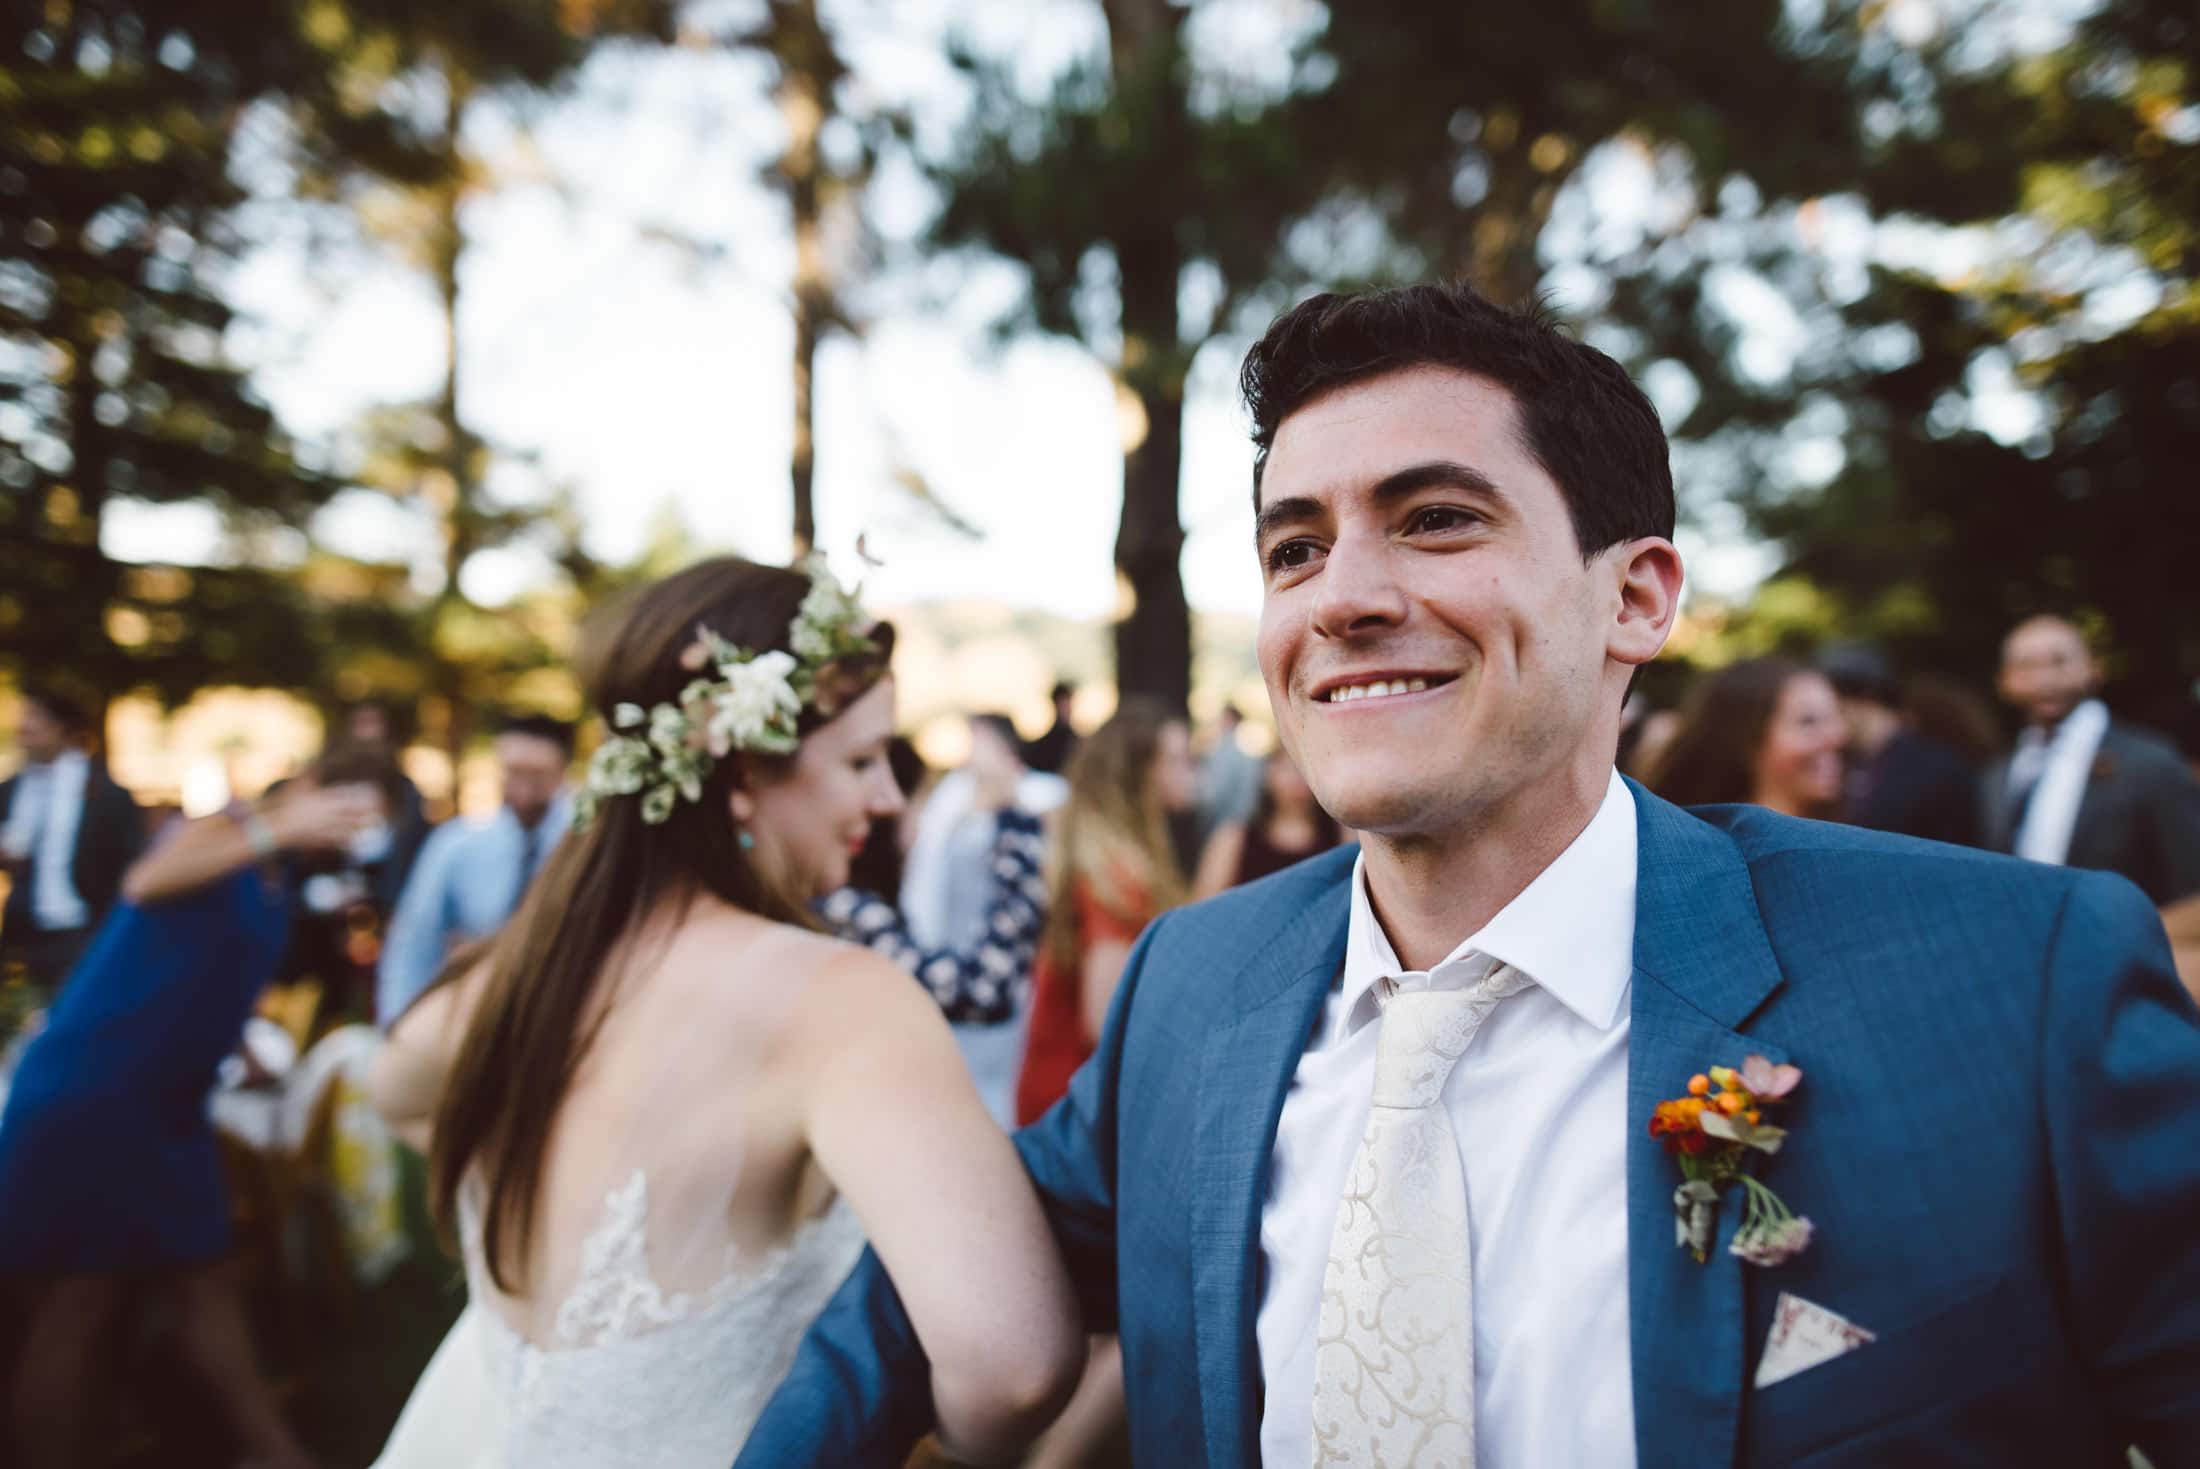 wedding ceremony at rancho nicasio in marin